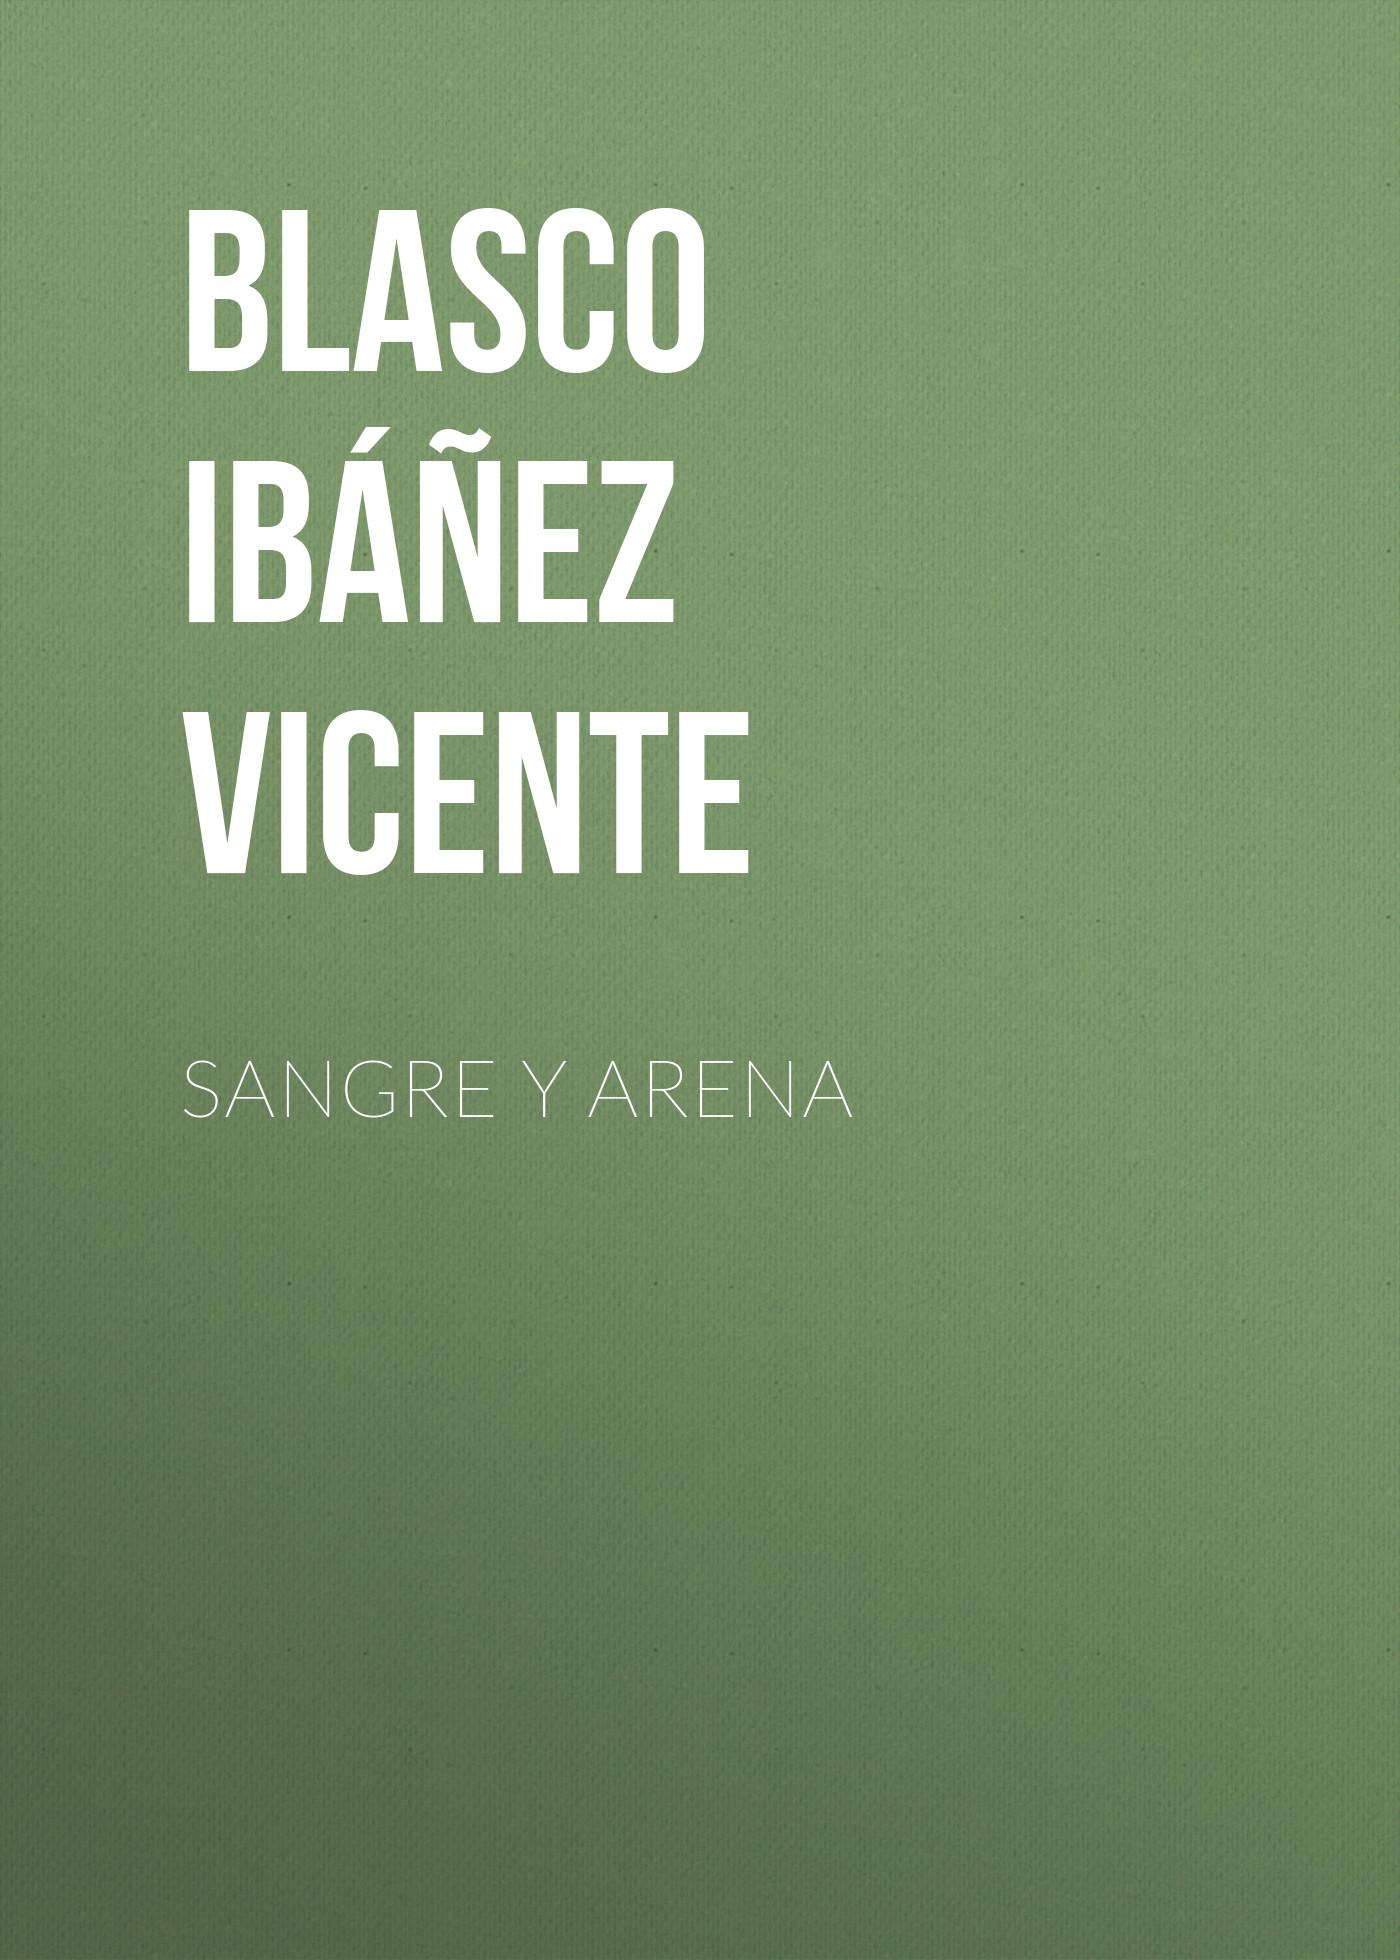 лучшая цена Blasco Ibáñez Vicente Sangre y arena